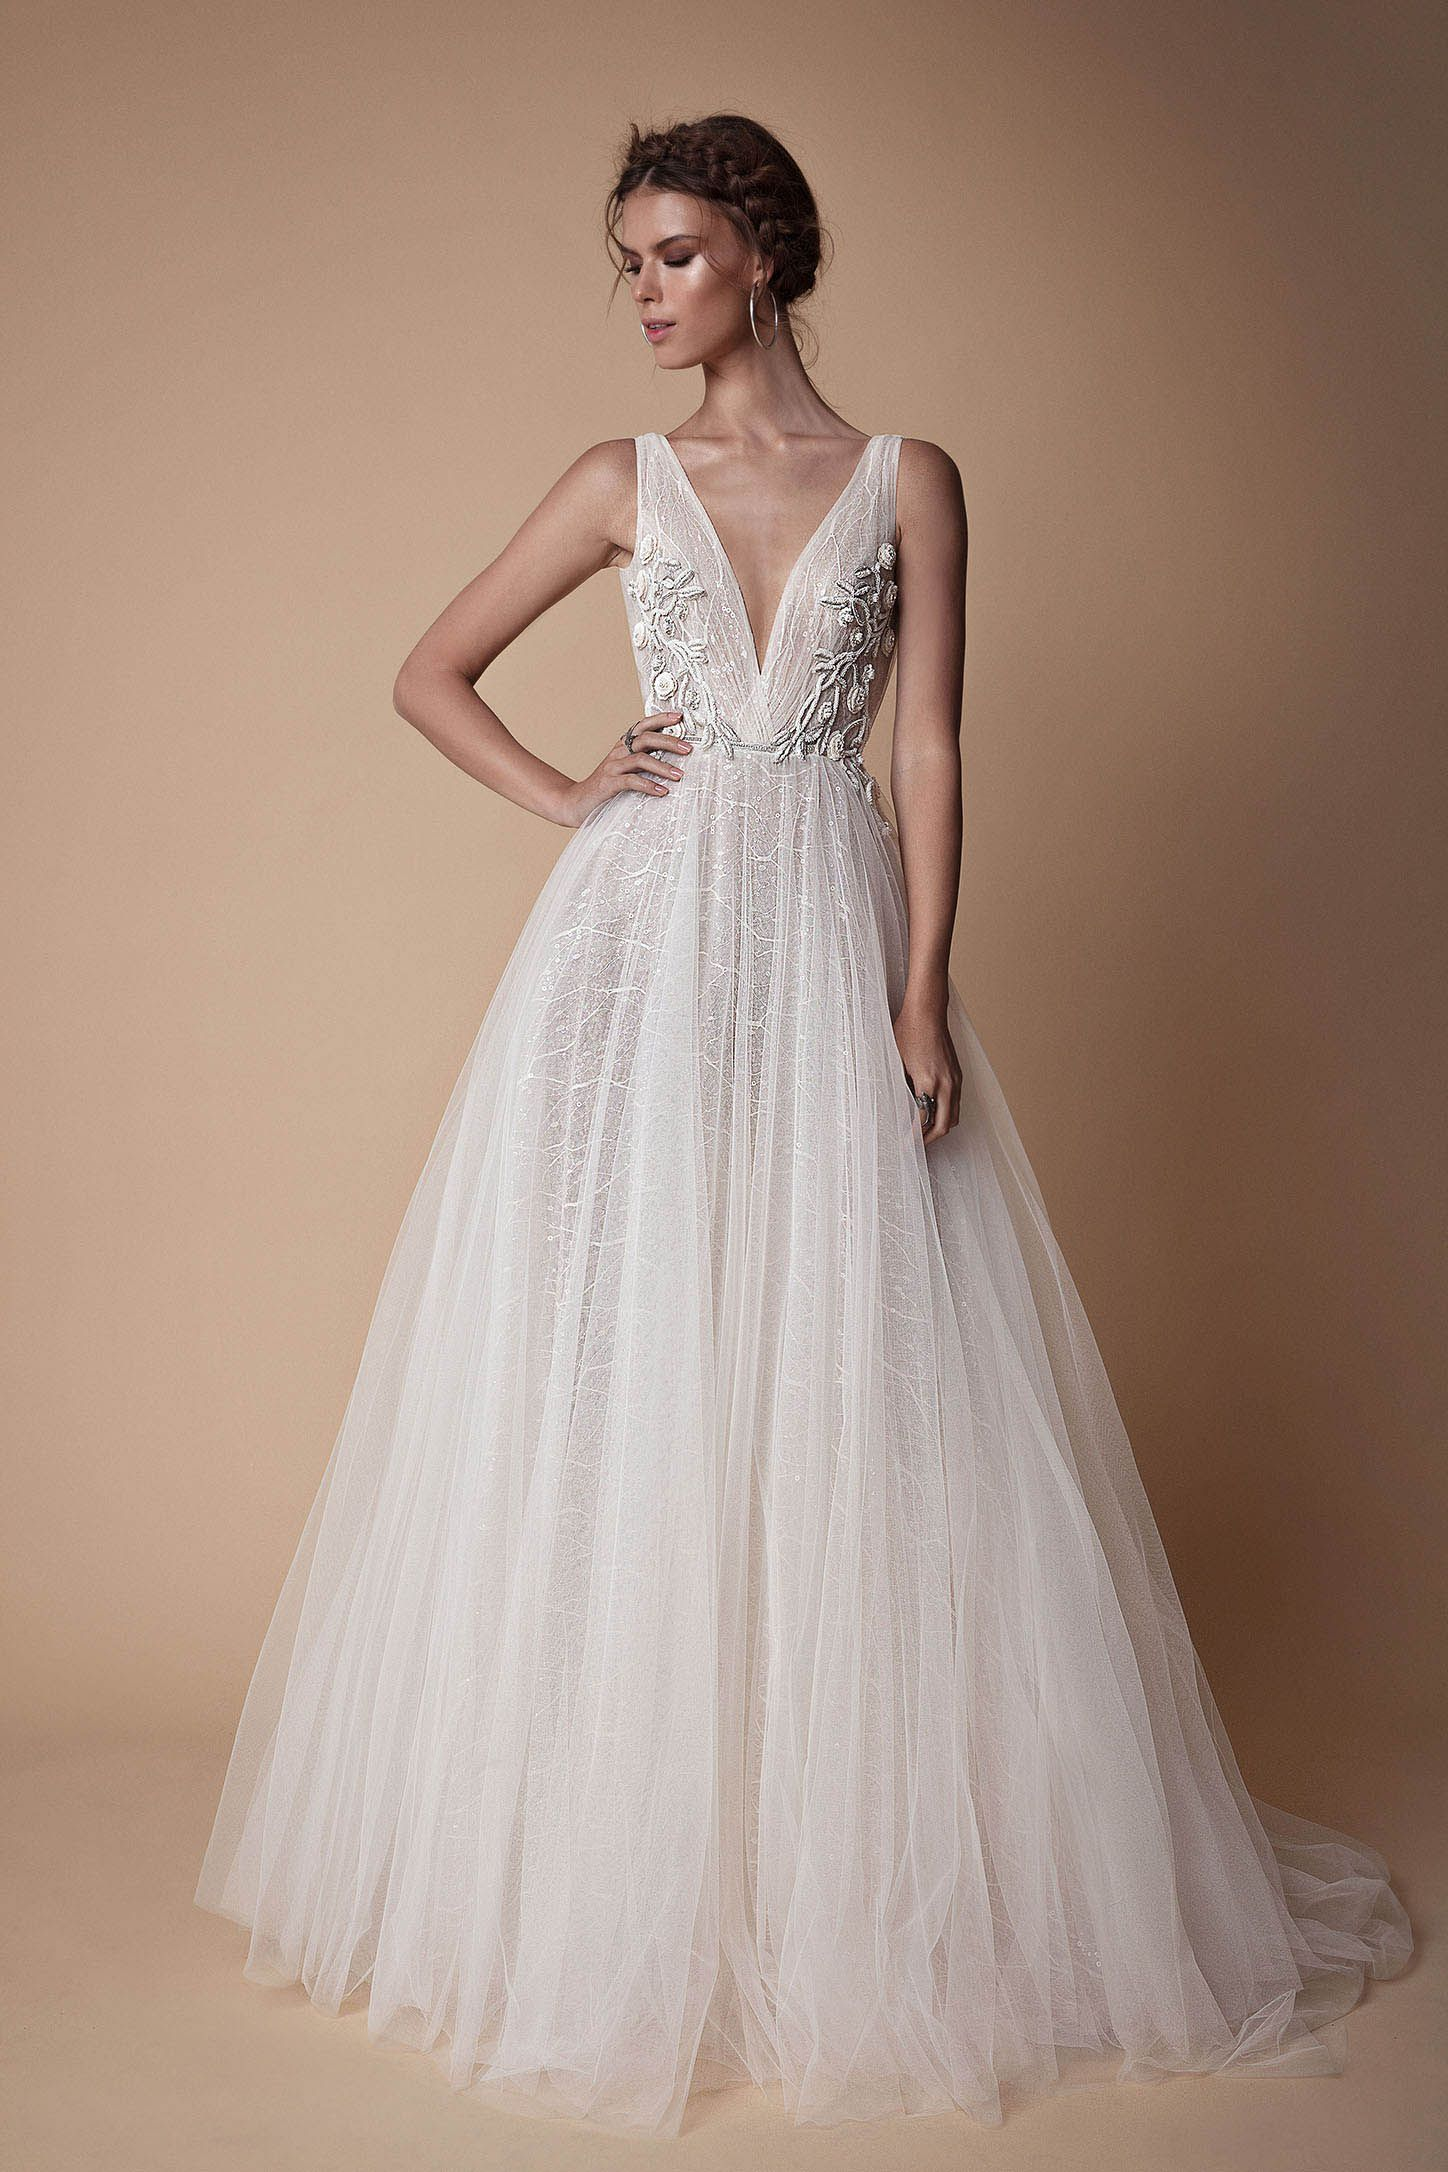 Muse berta outfits pinterest wedding dress wedding and